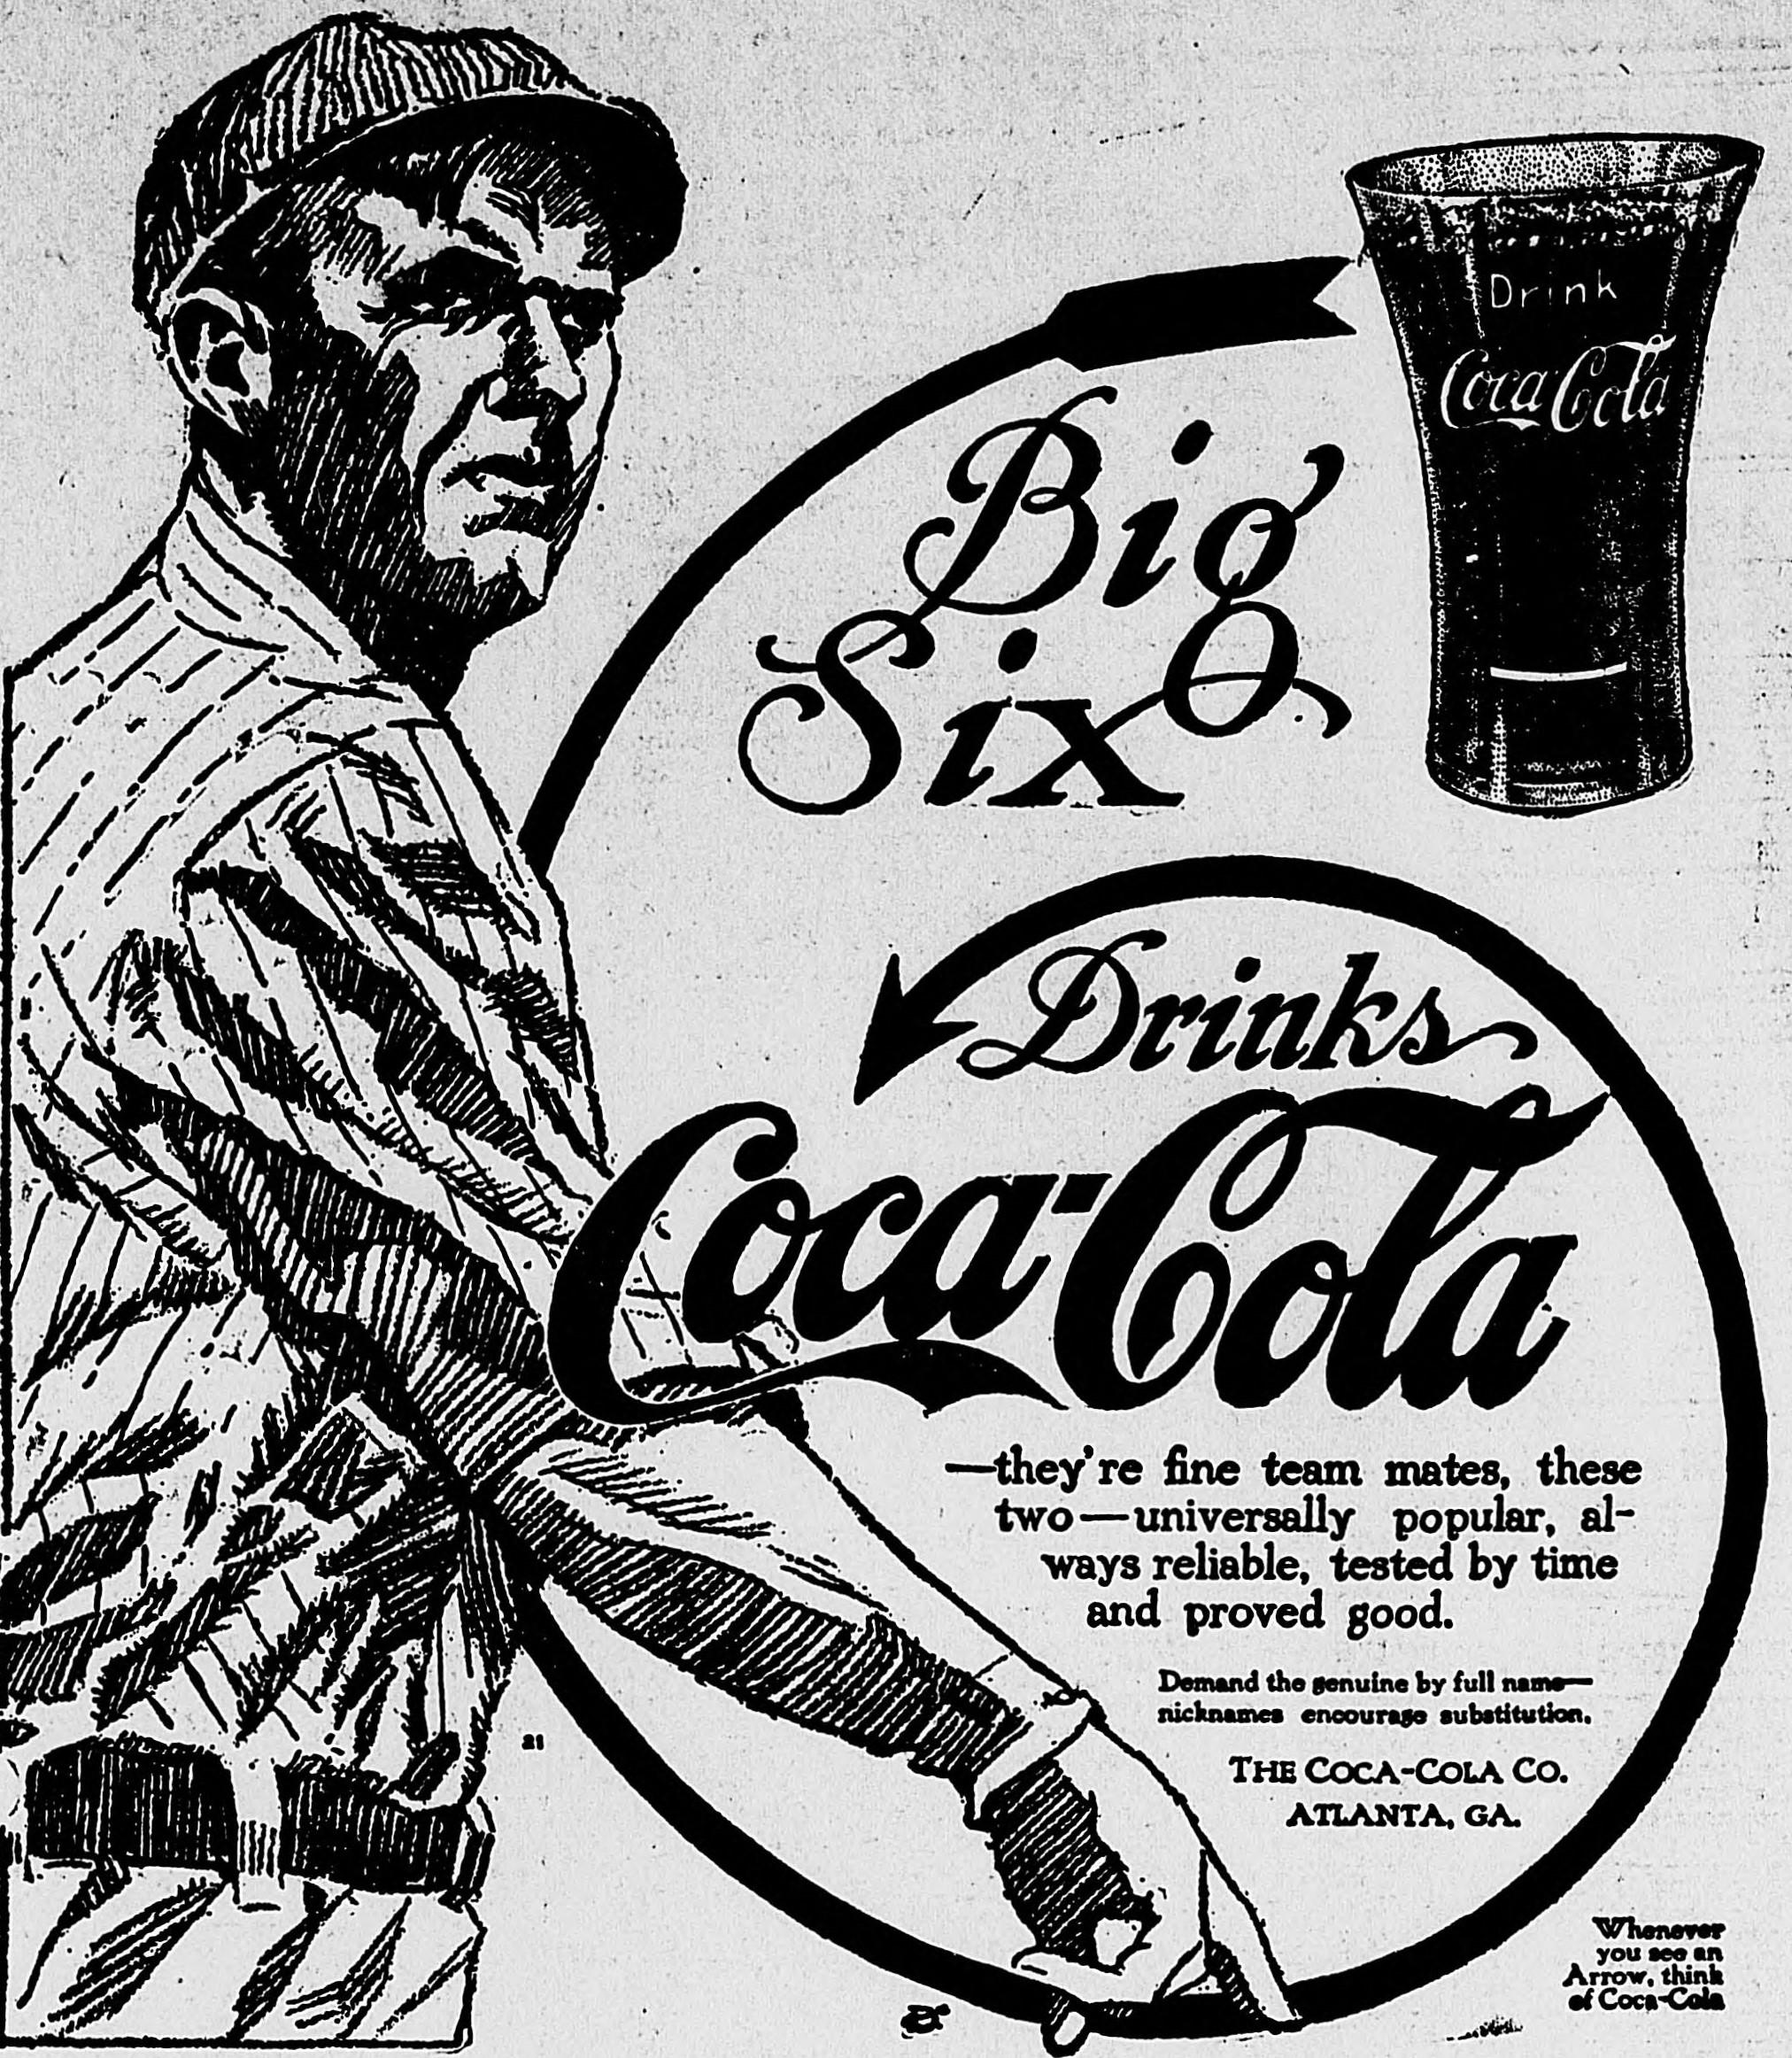 Lost Advertisements: Big Six for Coke